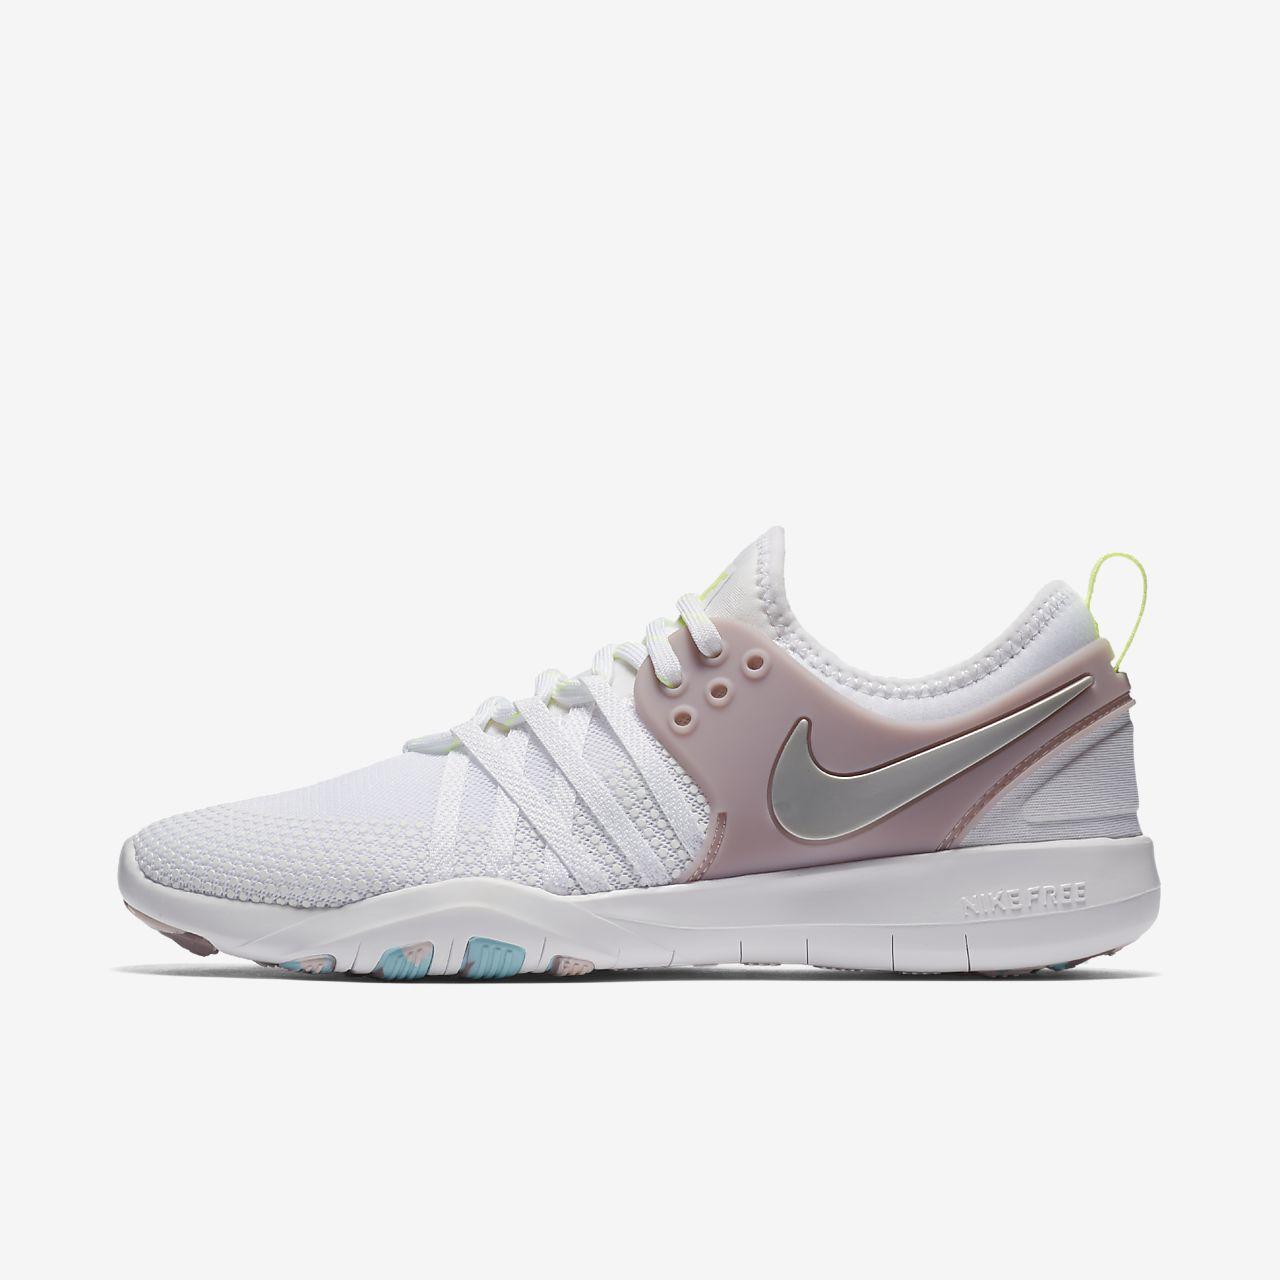 bf7589ad20e5 lyst nike free tr7 chrome blush sneakers in gray  nike free tr 7 womens  training shoe